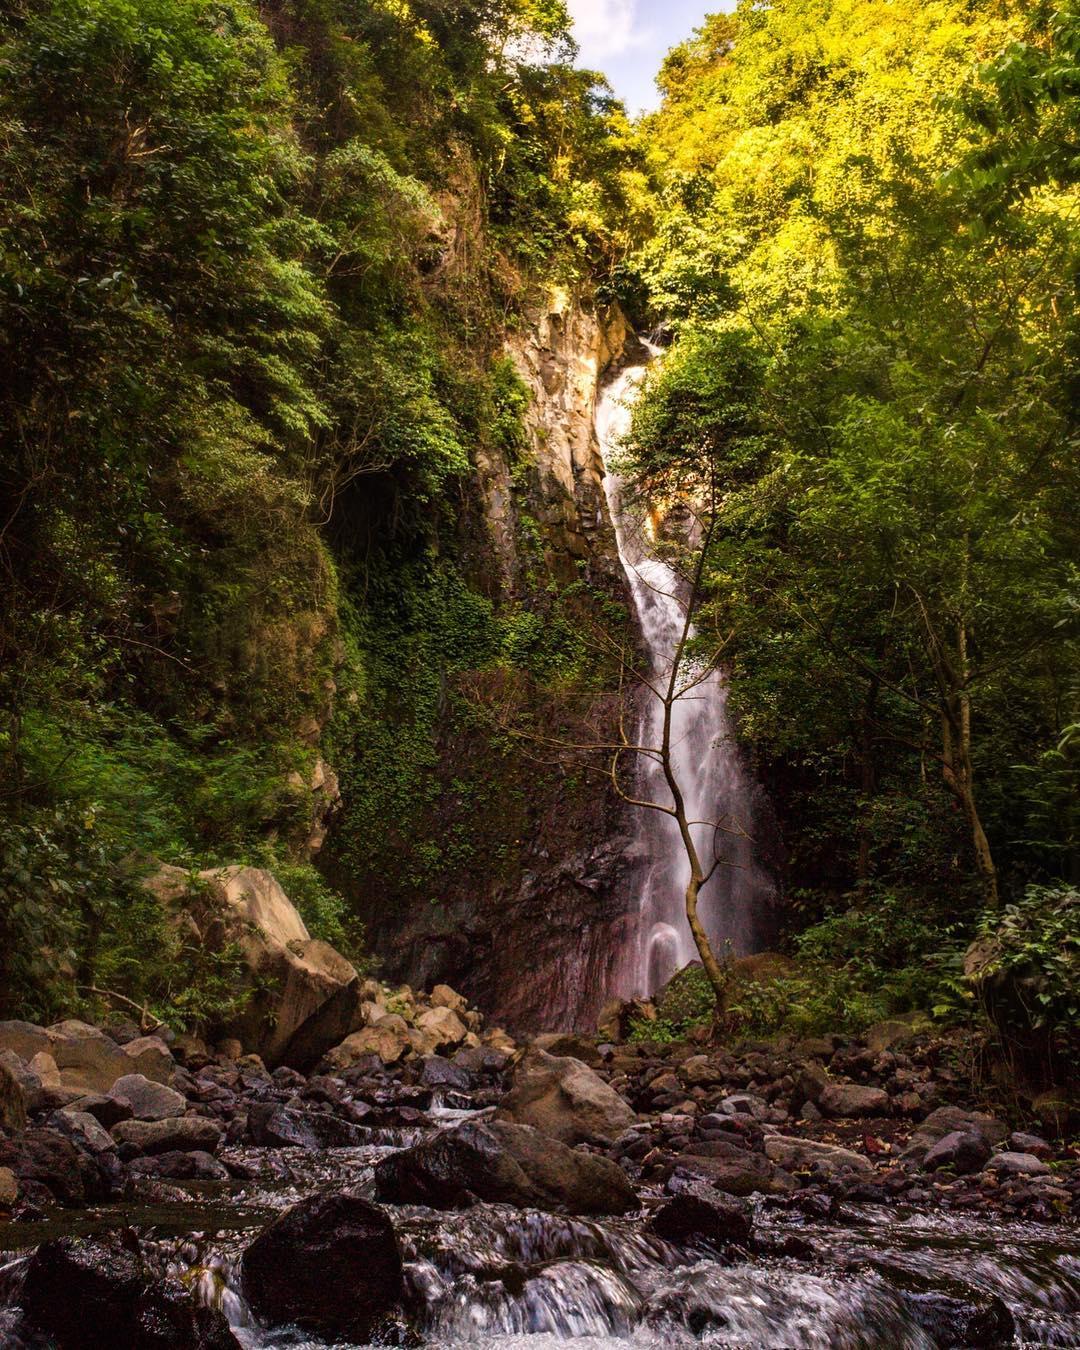 Waterfalls in Bali; Yeh Mampeh Waterfall